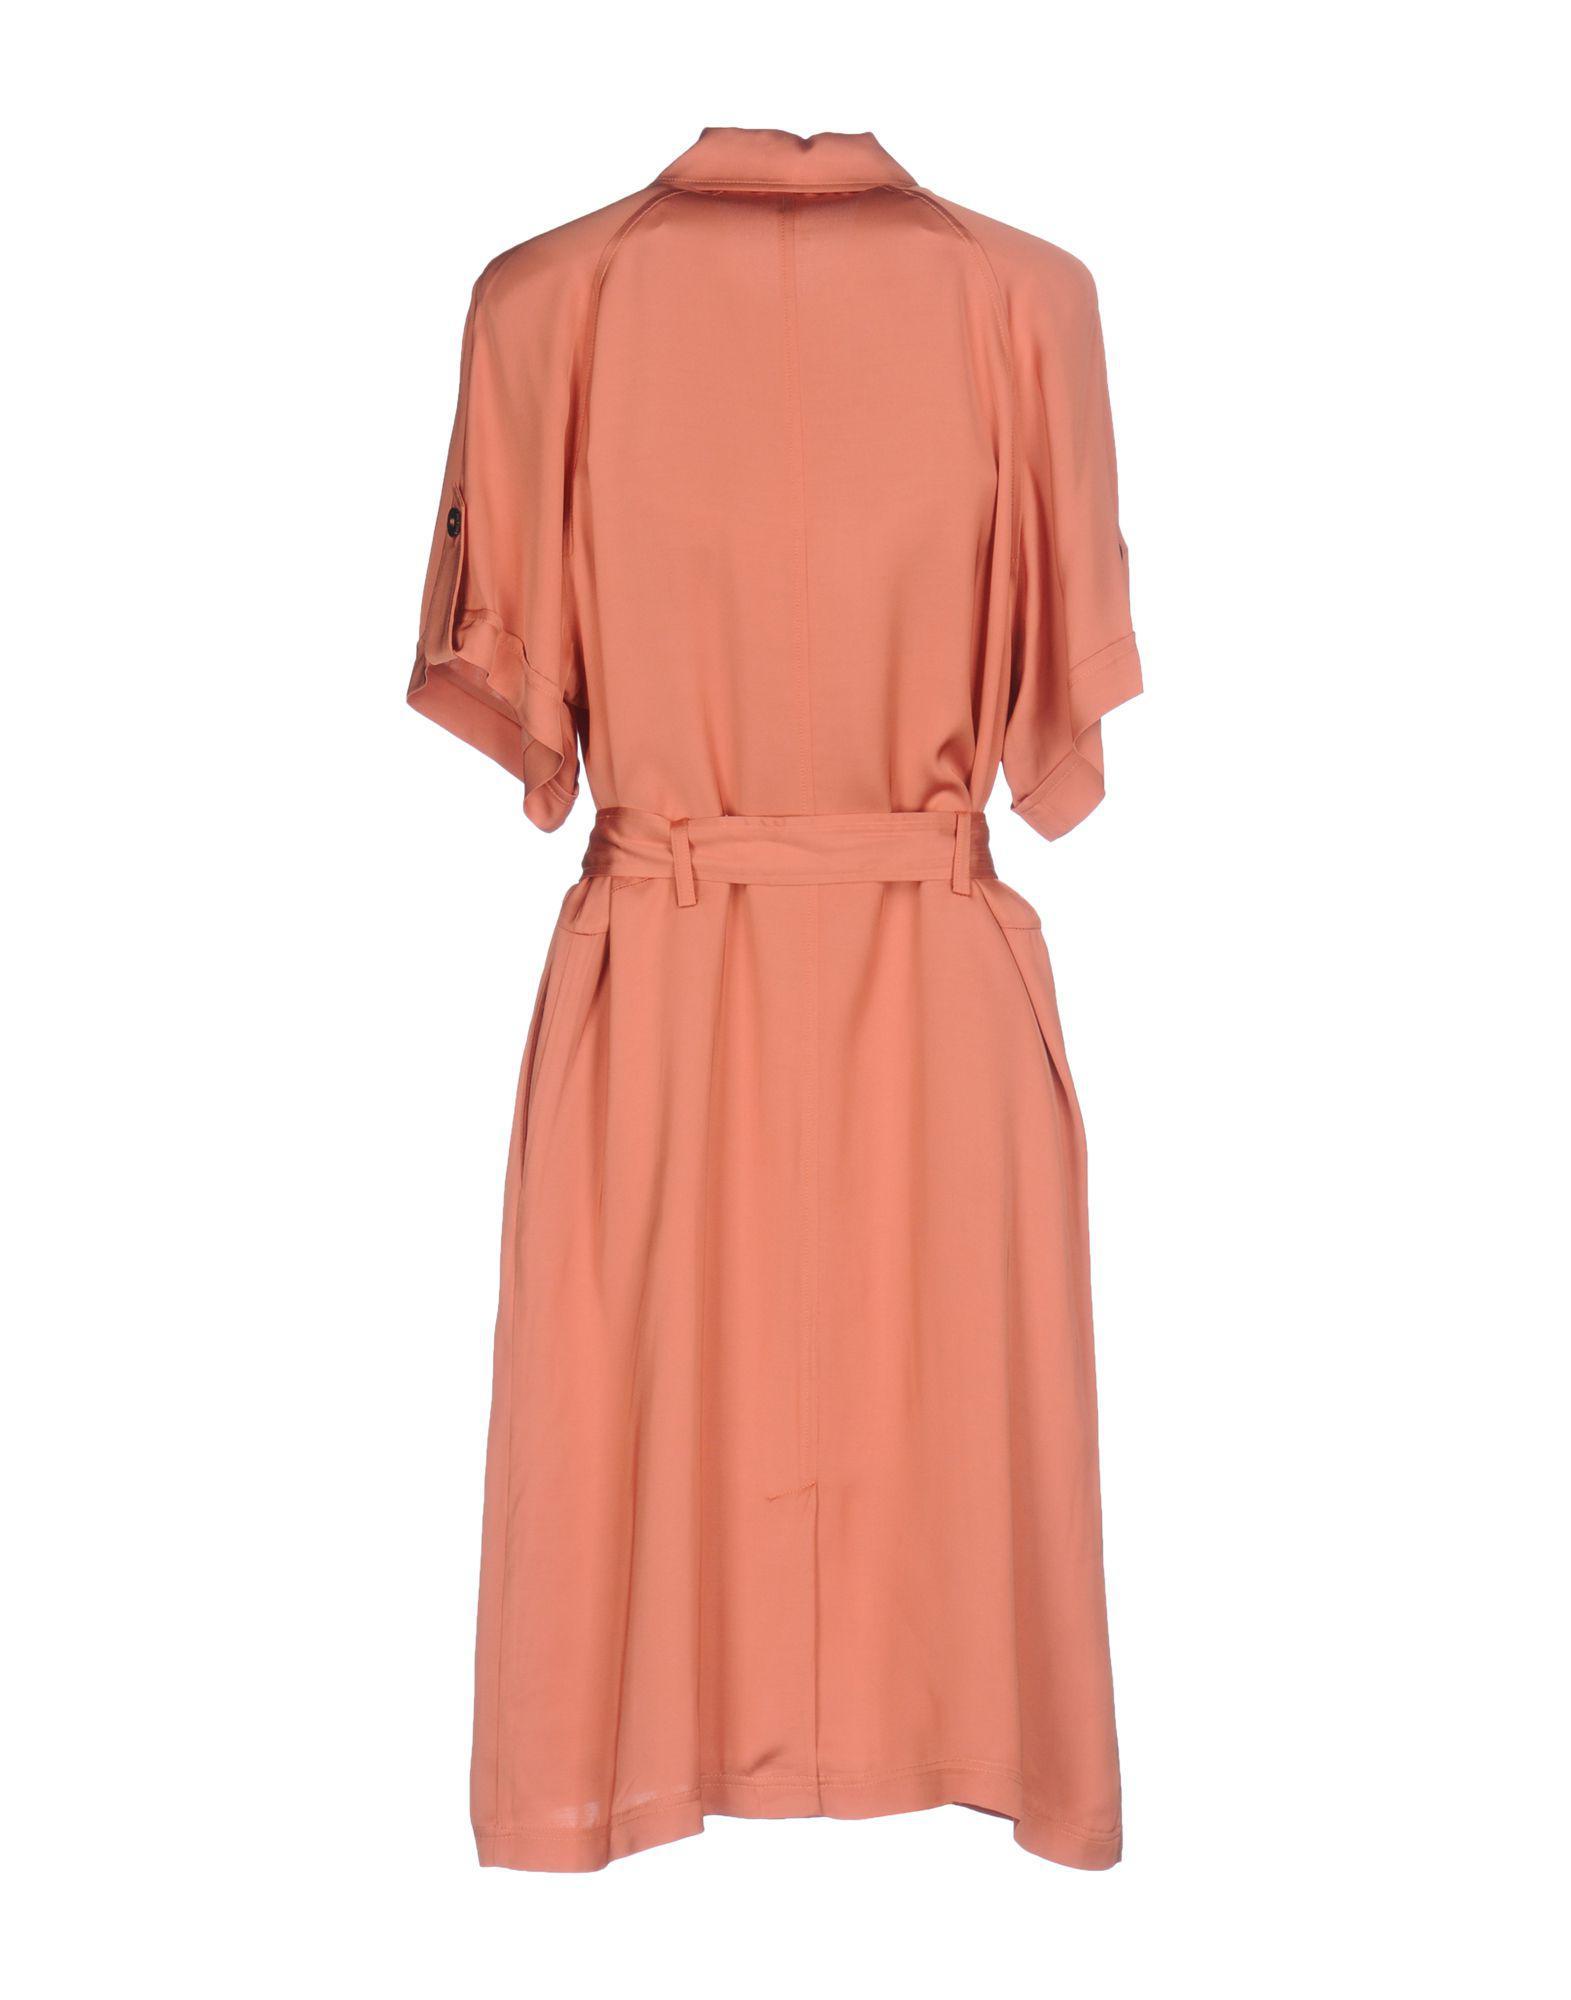 Exclusive Cheap Online Discount Excellent DRESSES - Knee-length dresses Paul & Joe Enjoy For Sale Cheap Price Fake Sale Shopping Online x4kVTPBY